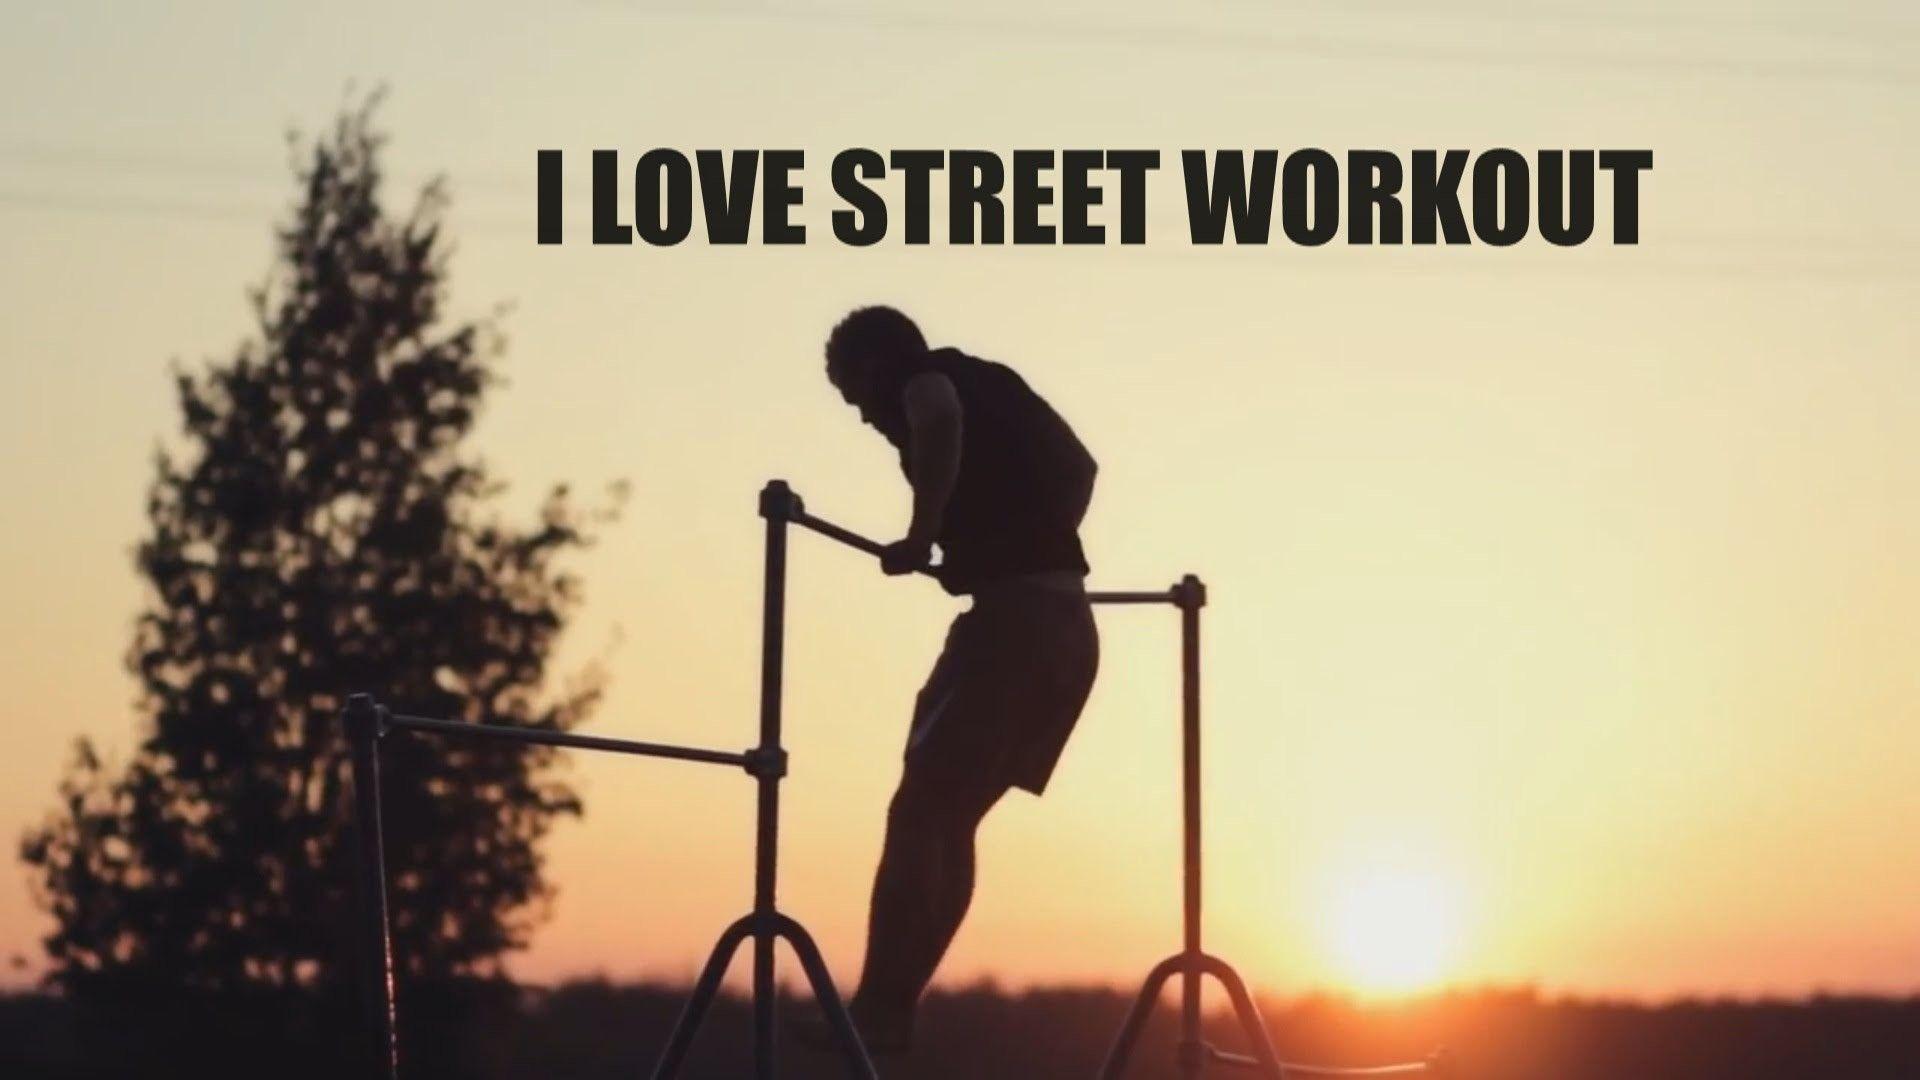 KEEP CALM AND DO STREET WORKOUT Poster | Tomhubacek | Keep ... |Street Workout Wallpaper